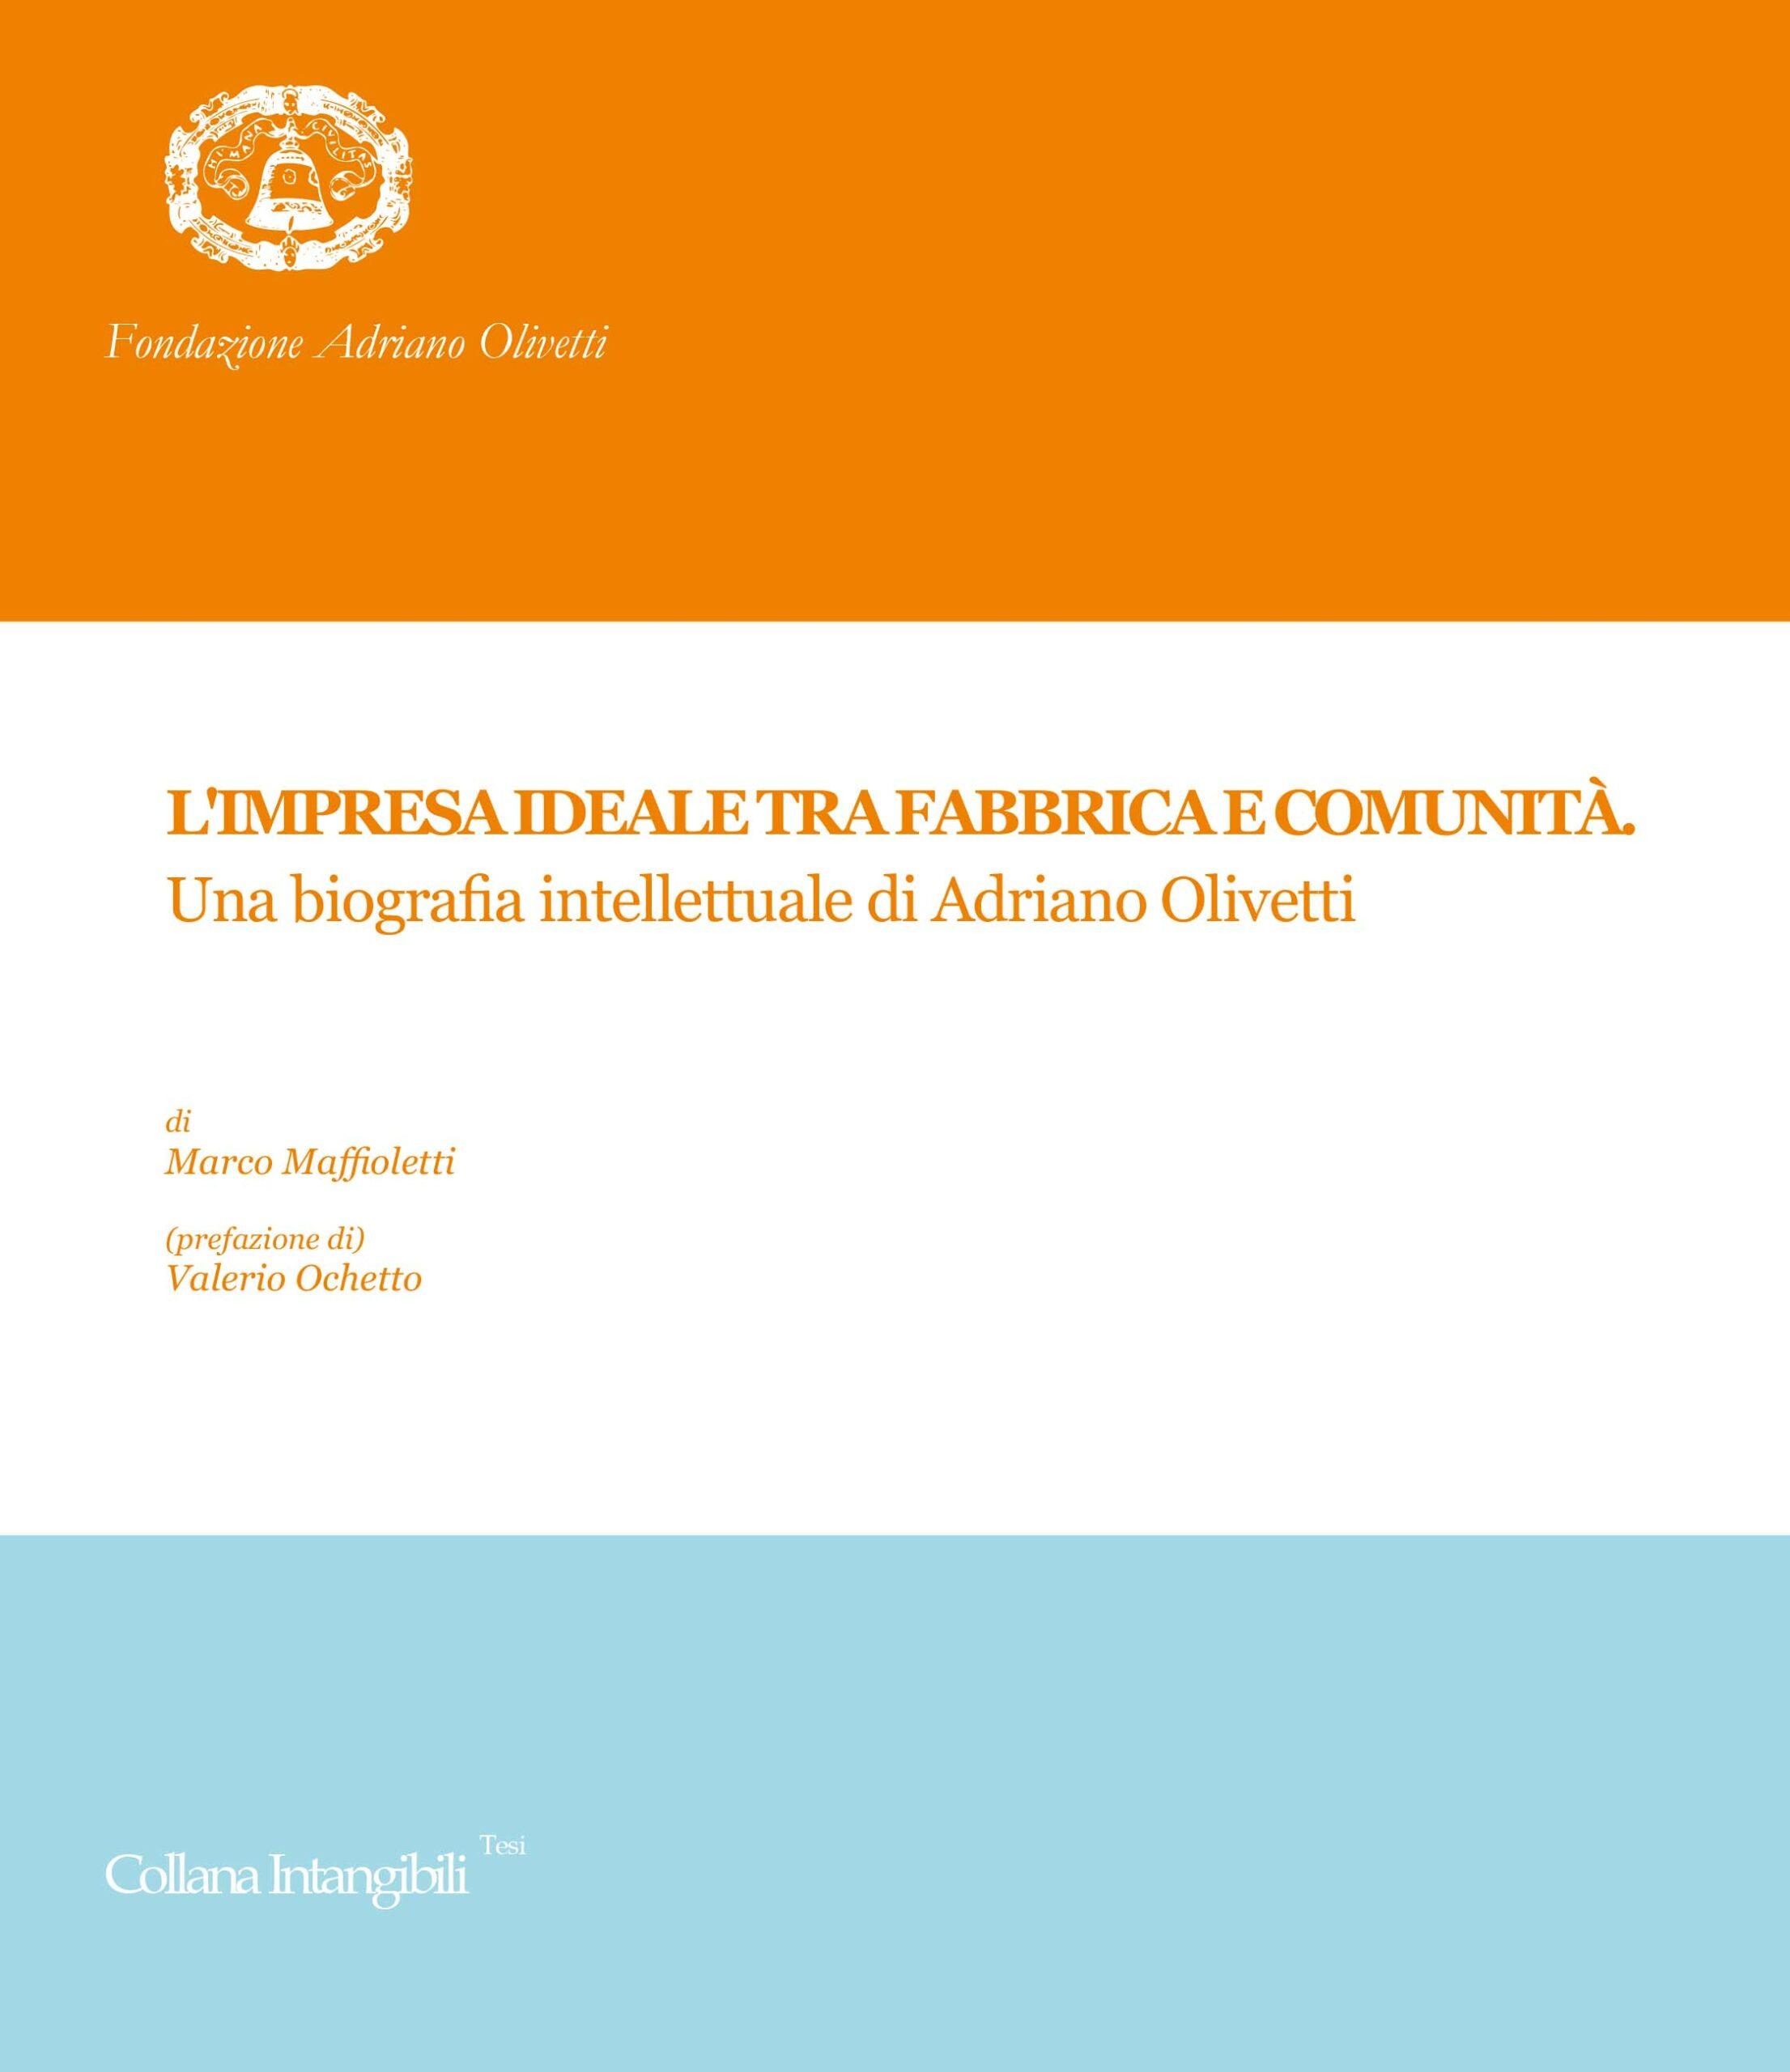 Serie Tesi Collana Intangibili impresa Maffioletti